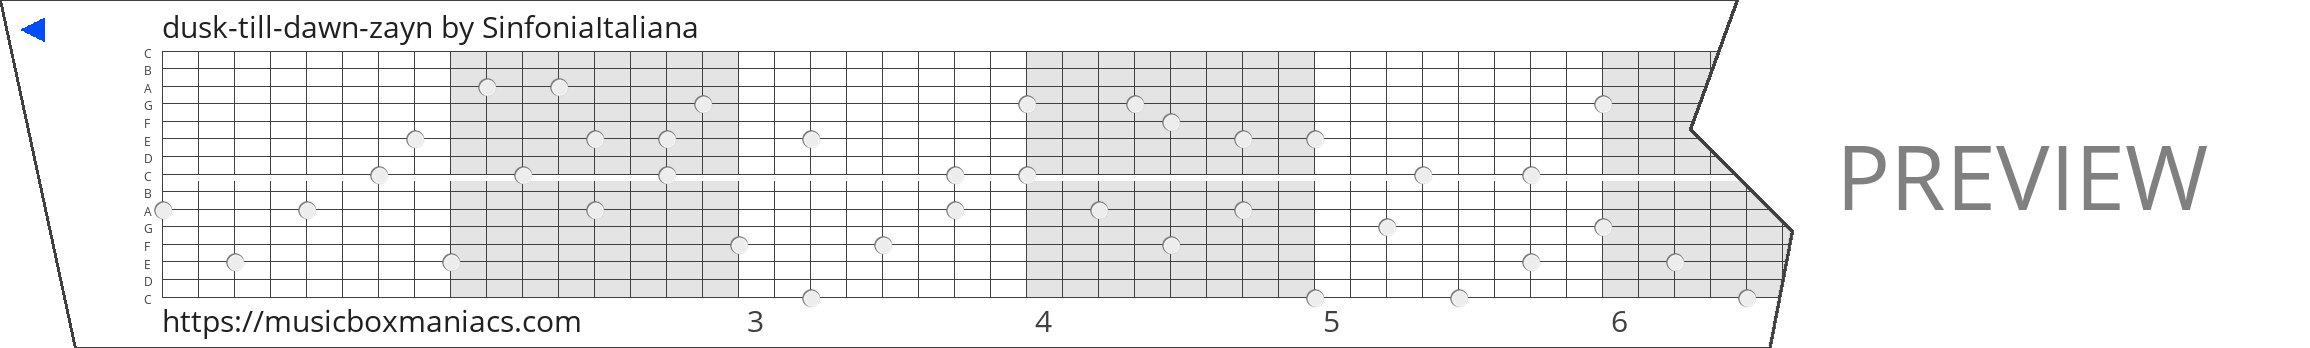 dusk-till-dawn-zayn 15 note music box paper strip